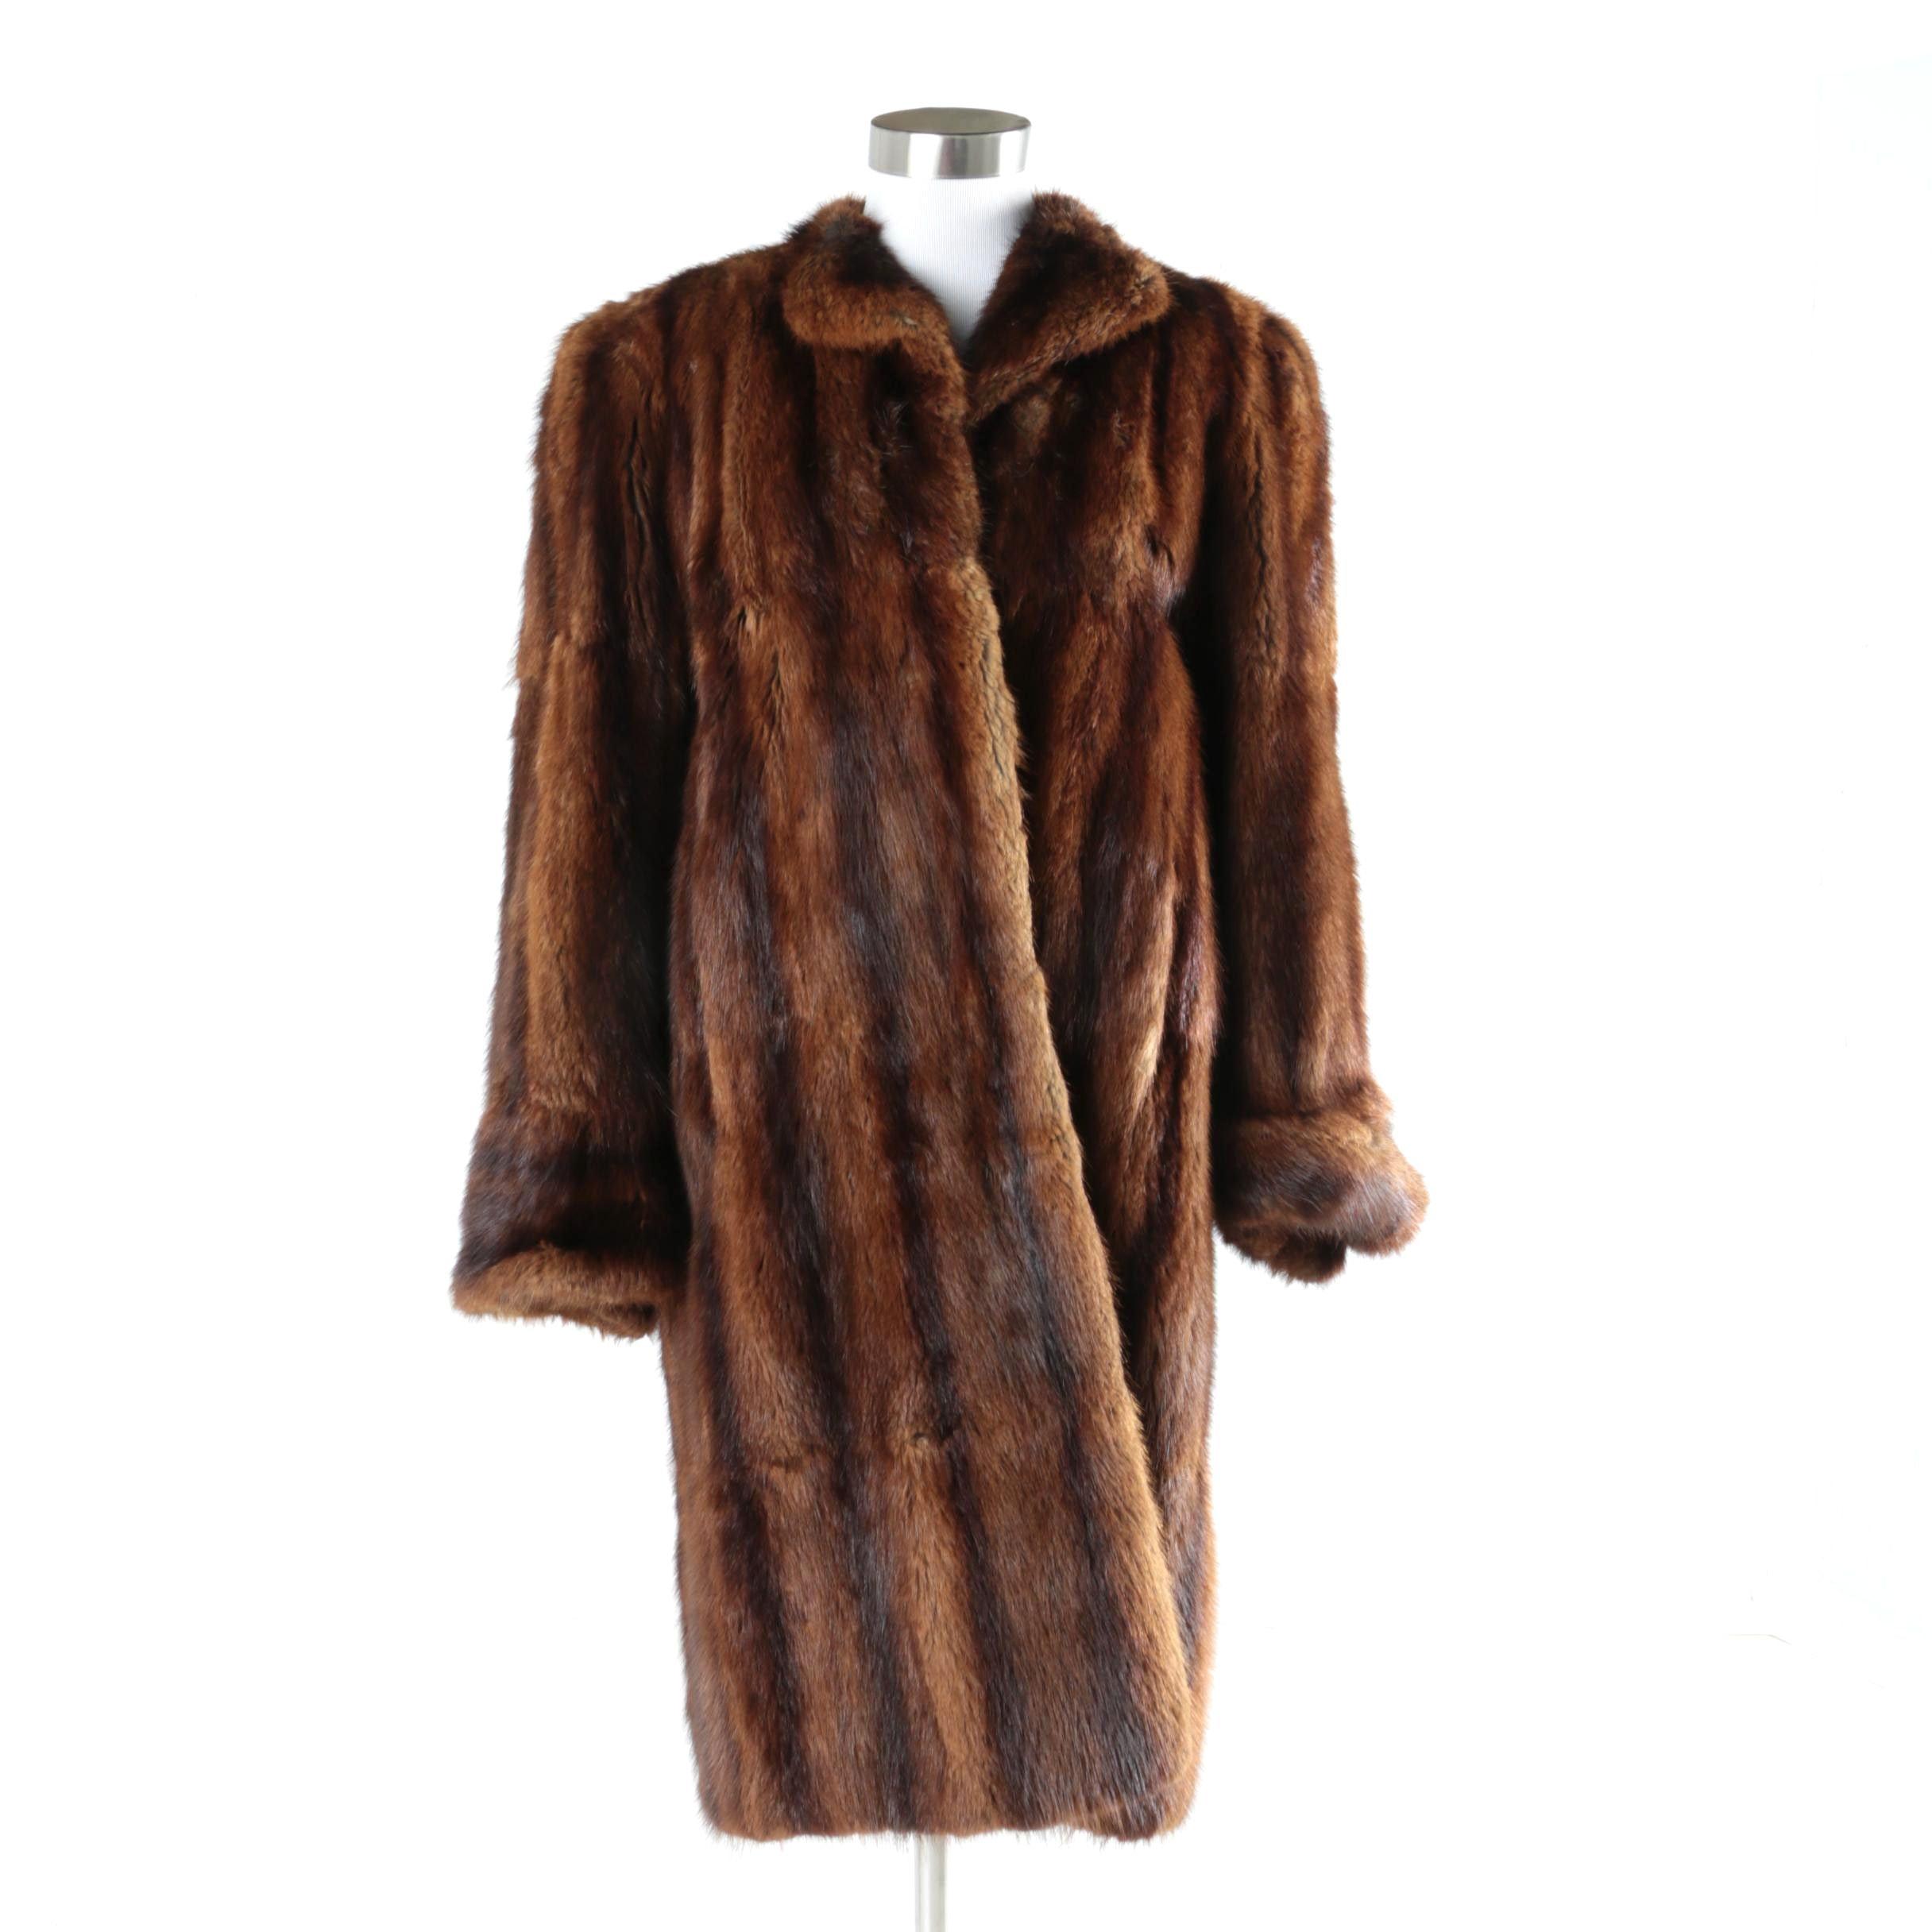 Vintage Dyed Muskrat Fur Coat